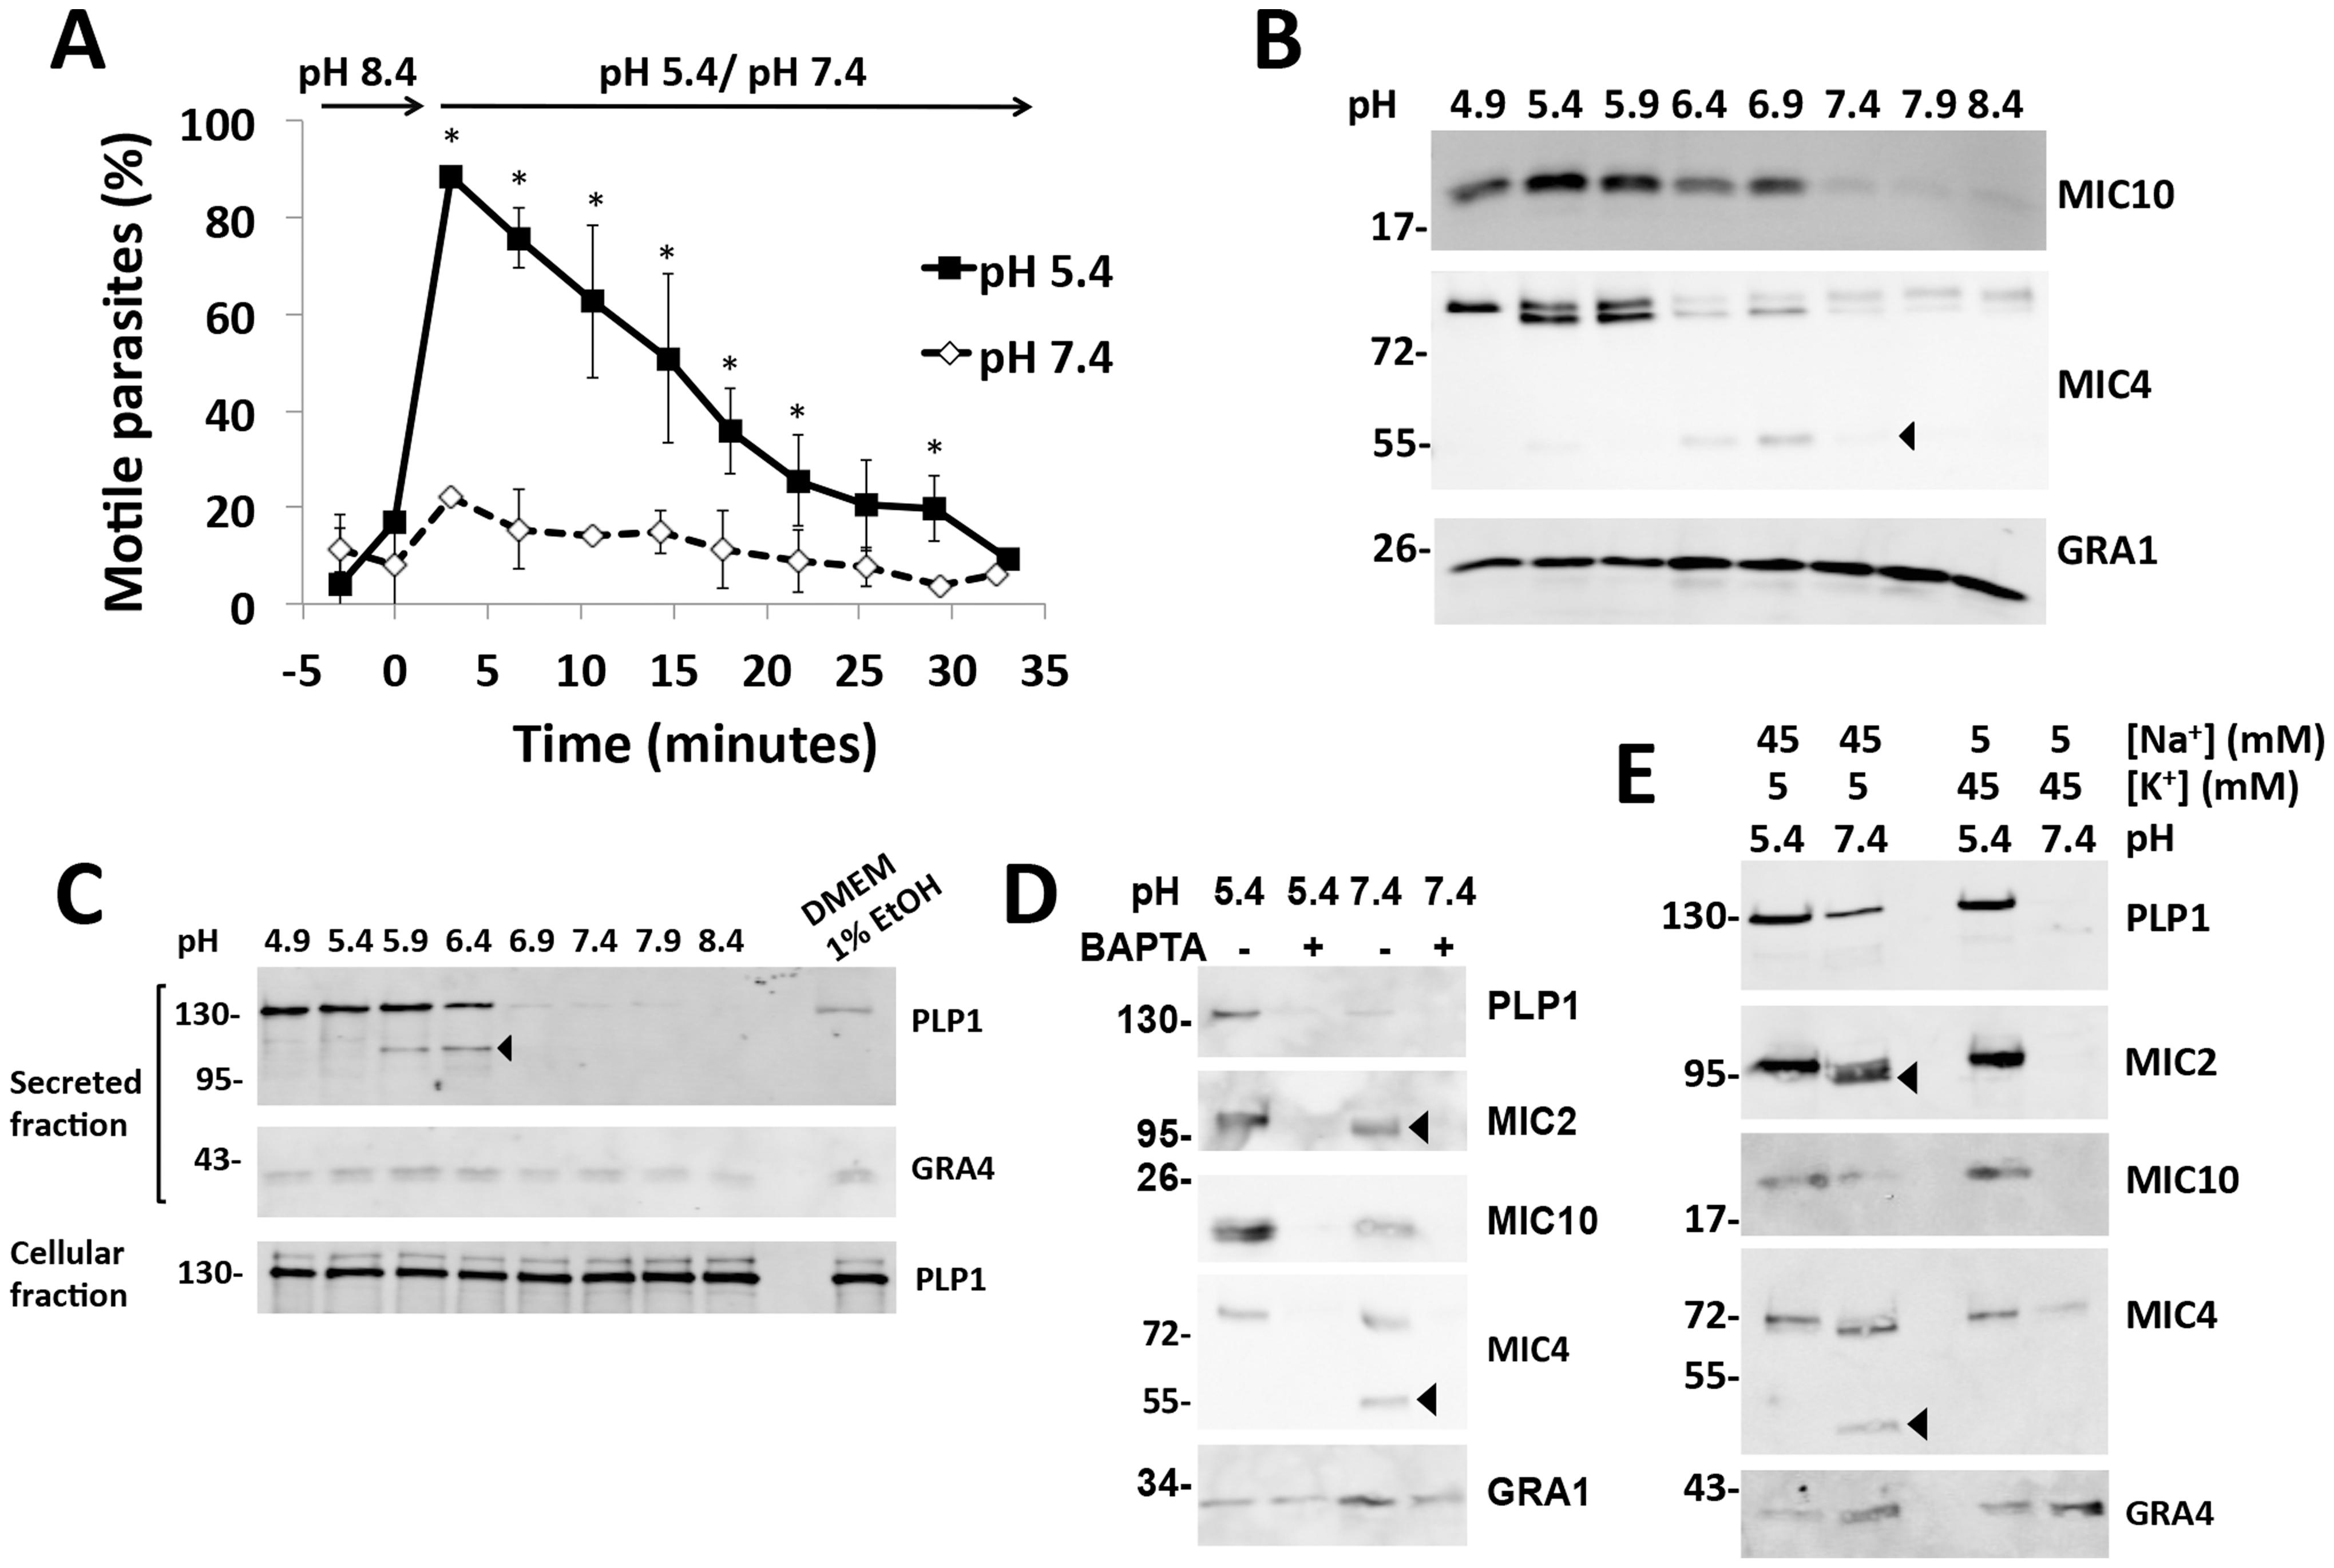 Low pH promotes parasite motility and microneme secretion.